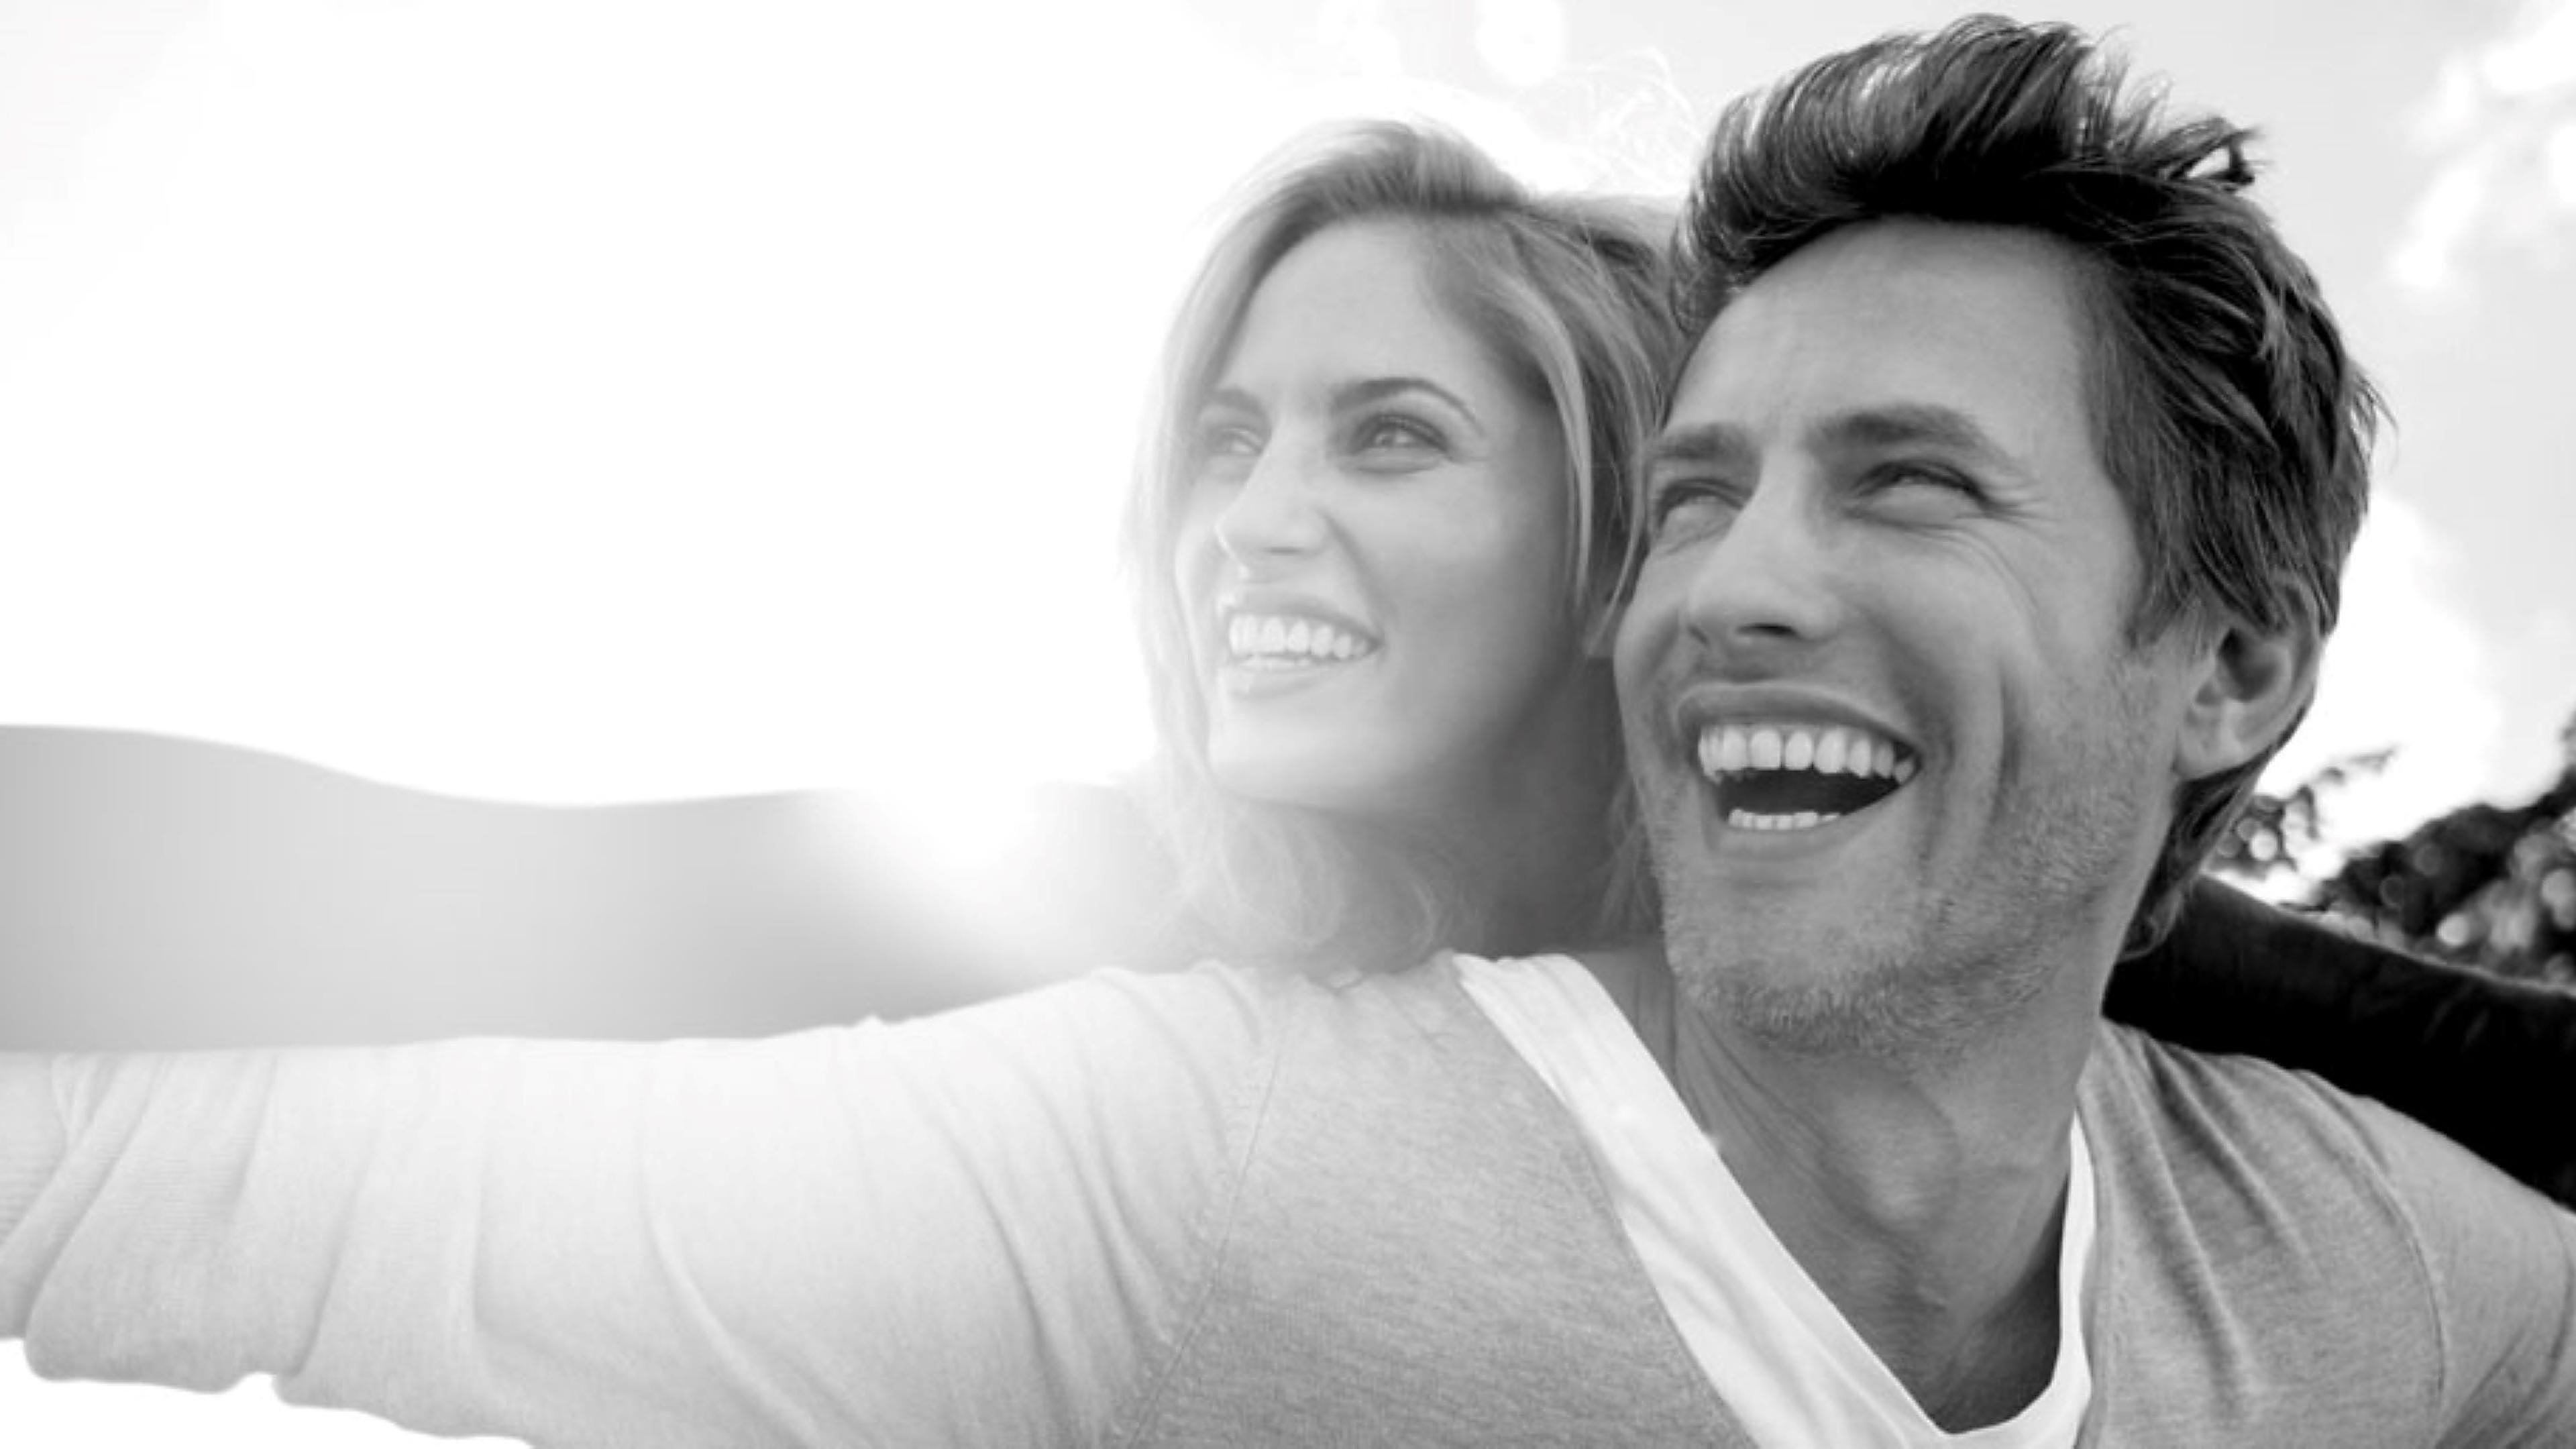 zayn malik falske dating fanfic